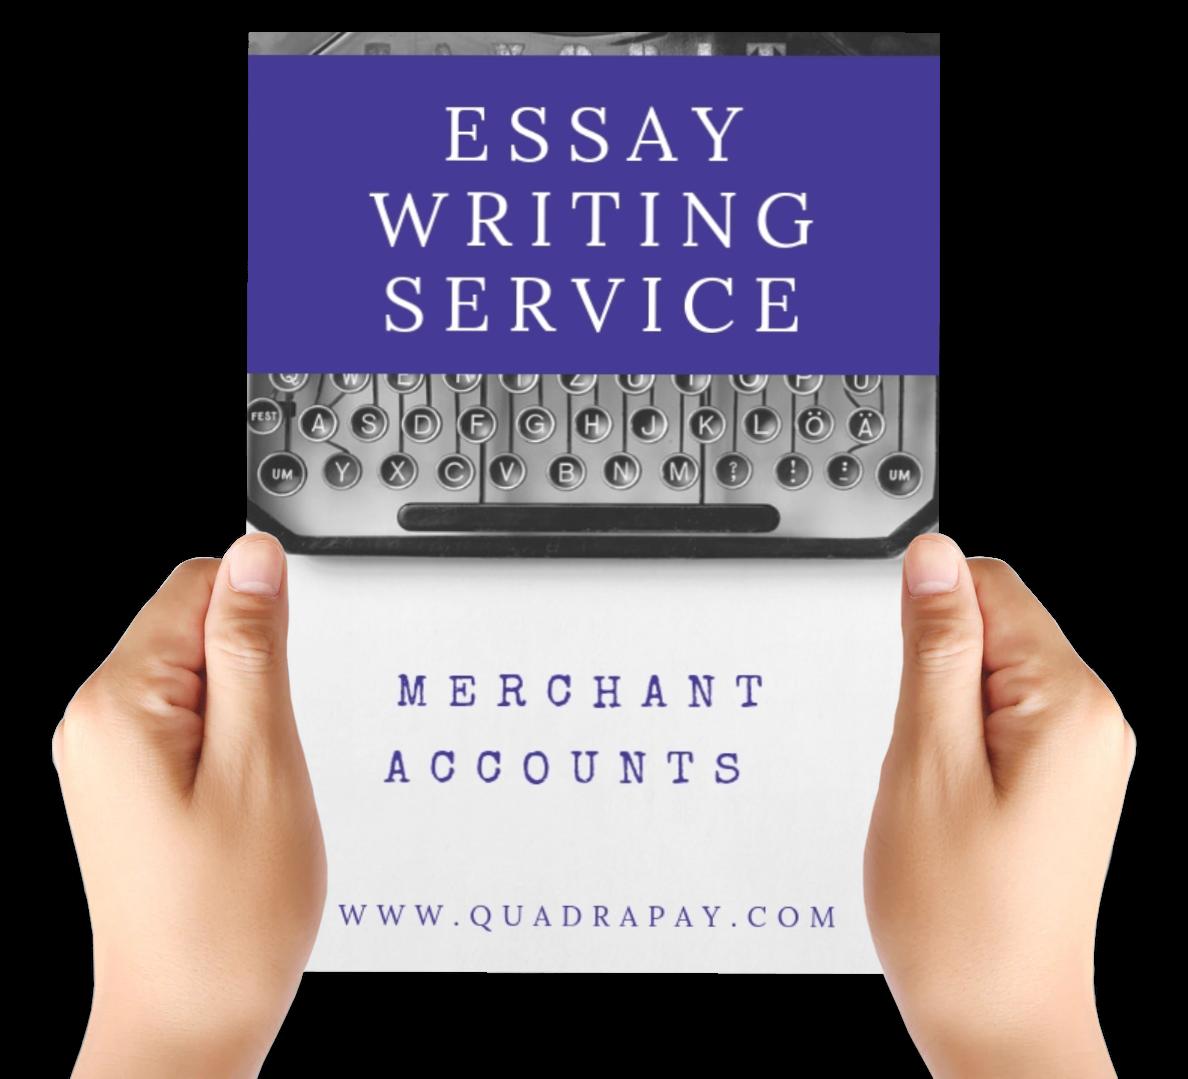 Merchant Accounts for Eassay Writing Websites By Quadrapay